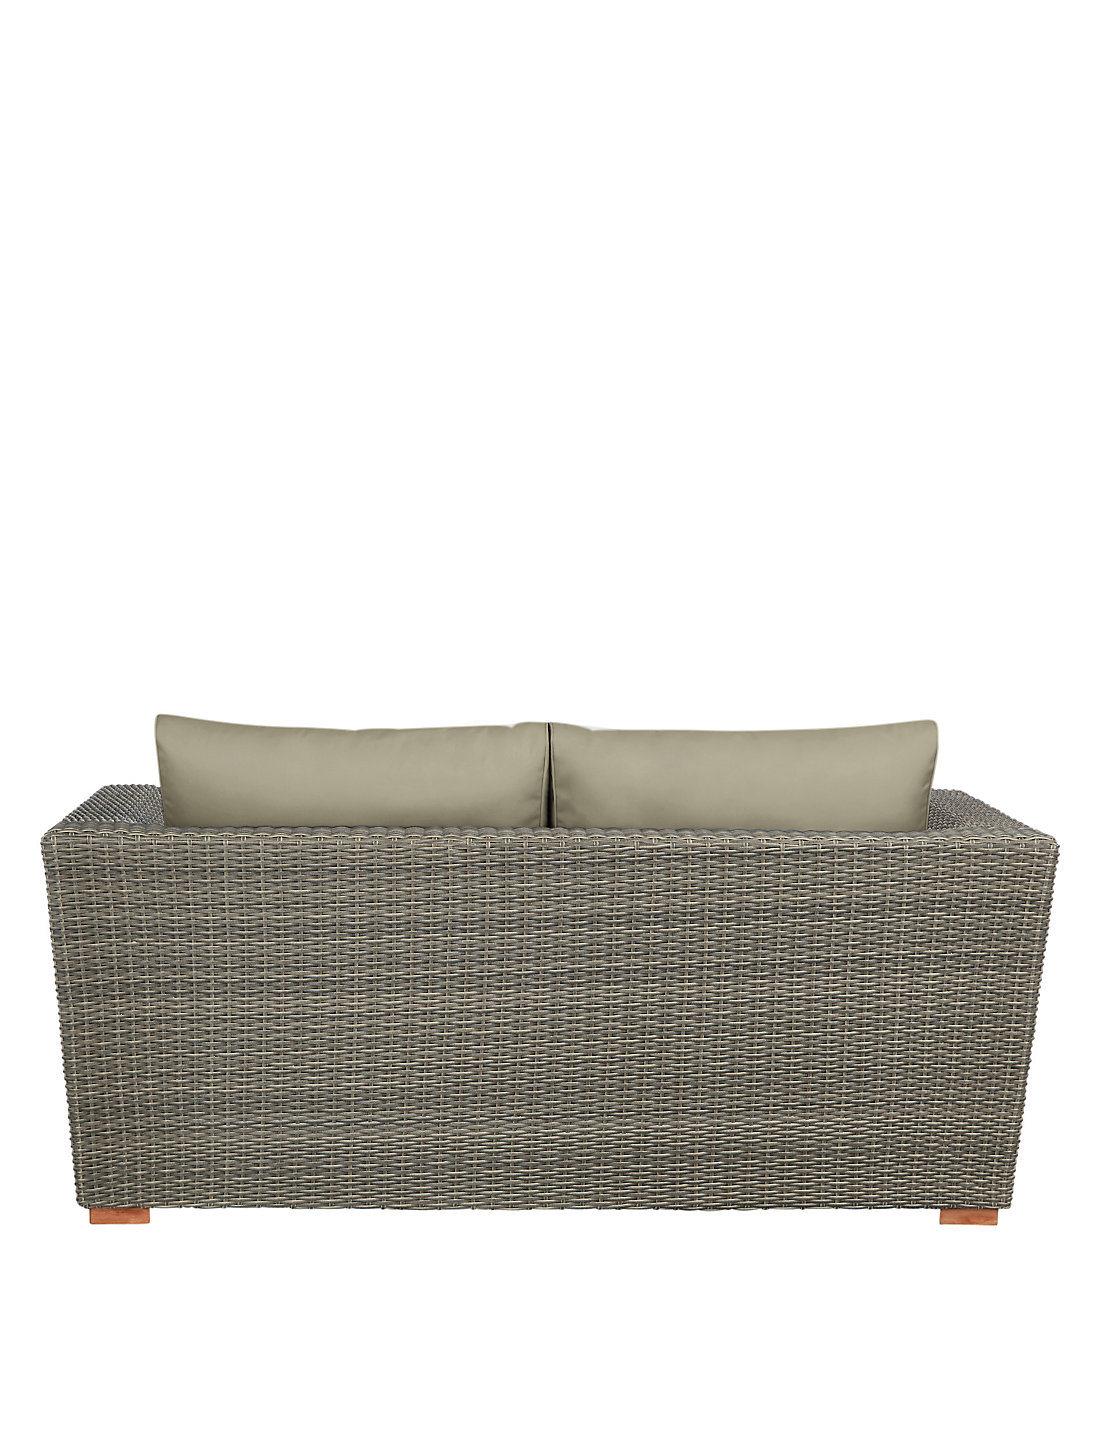 Well Furnir T-041 Grey Color Rattan Sofa with Waterproof Cushion